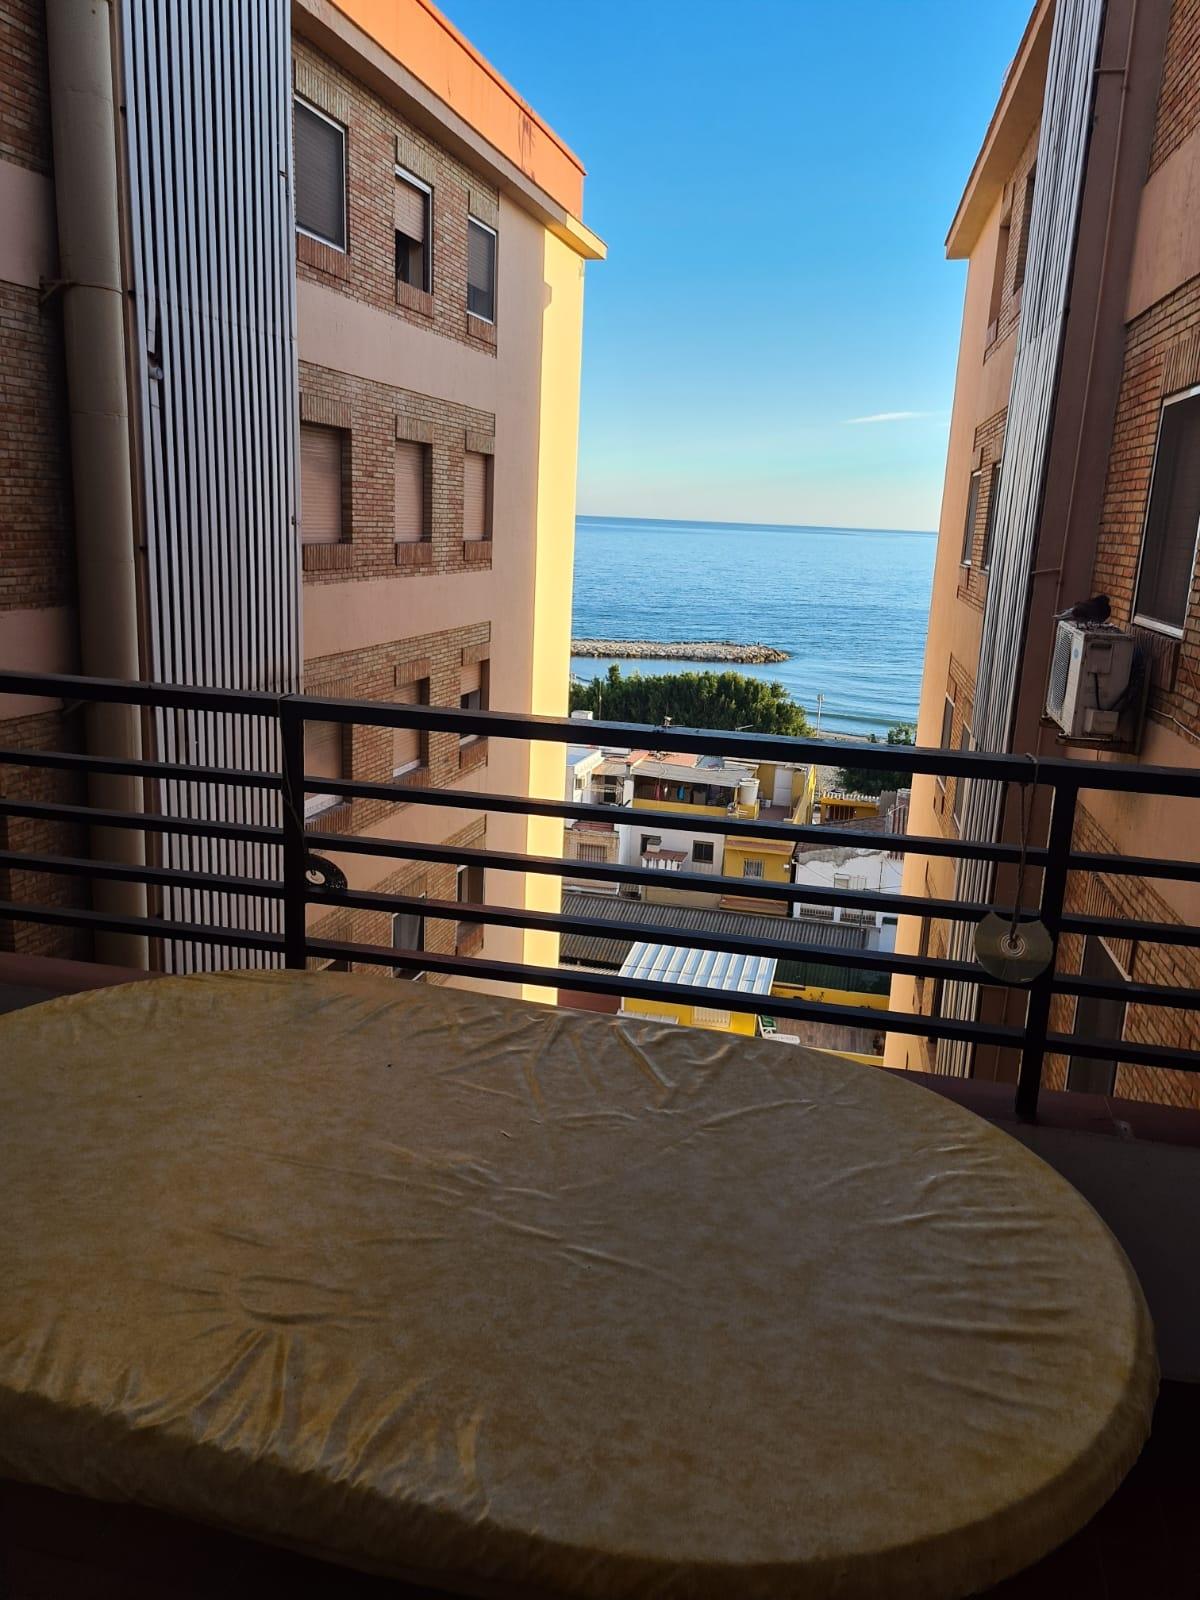 Flat for sale in El Palo, Malaga